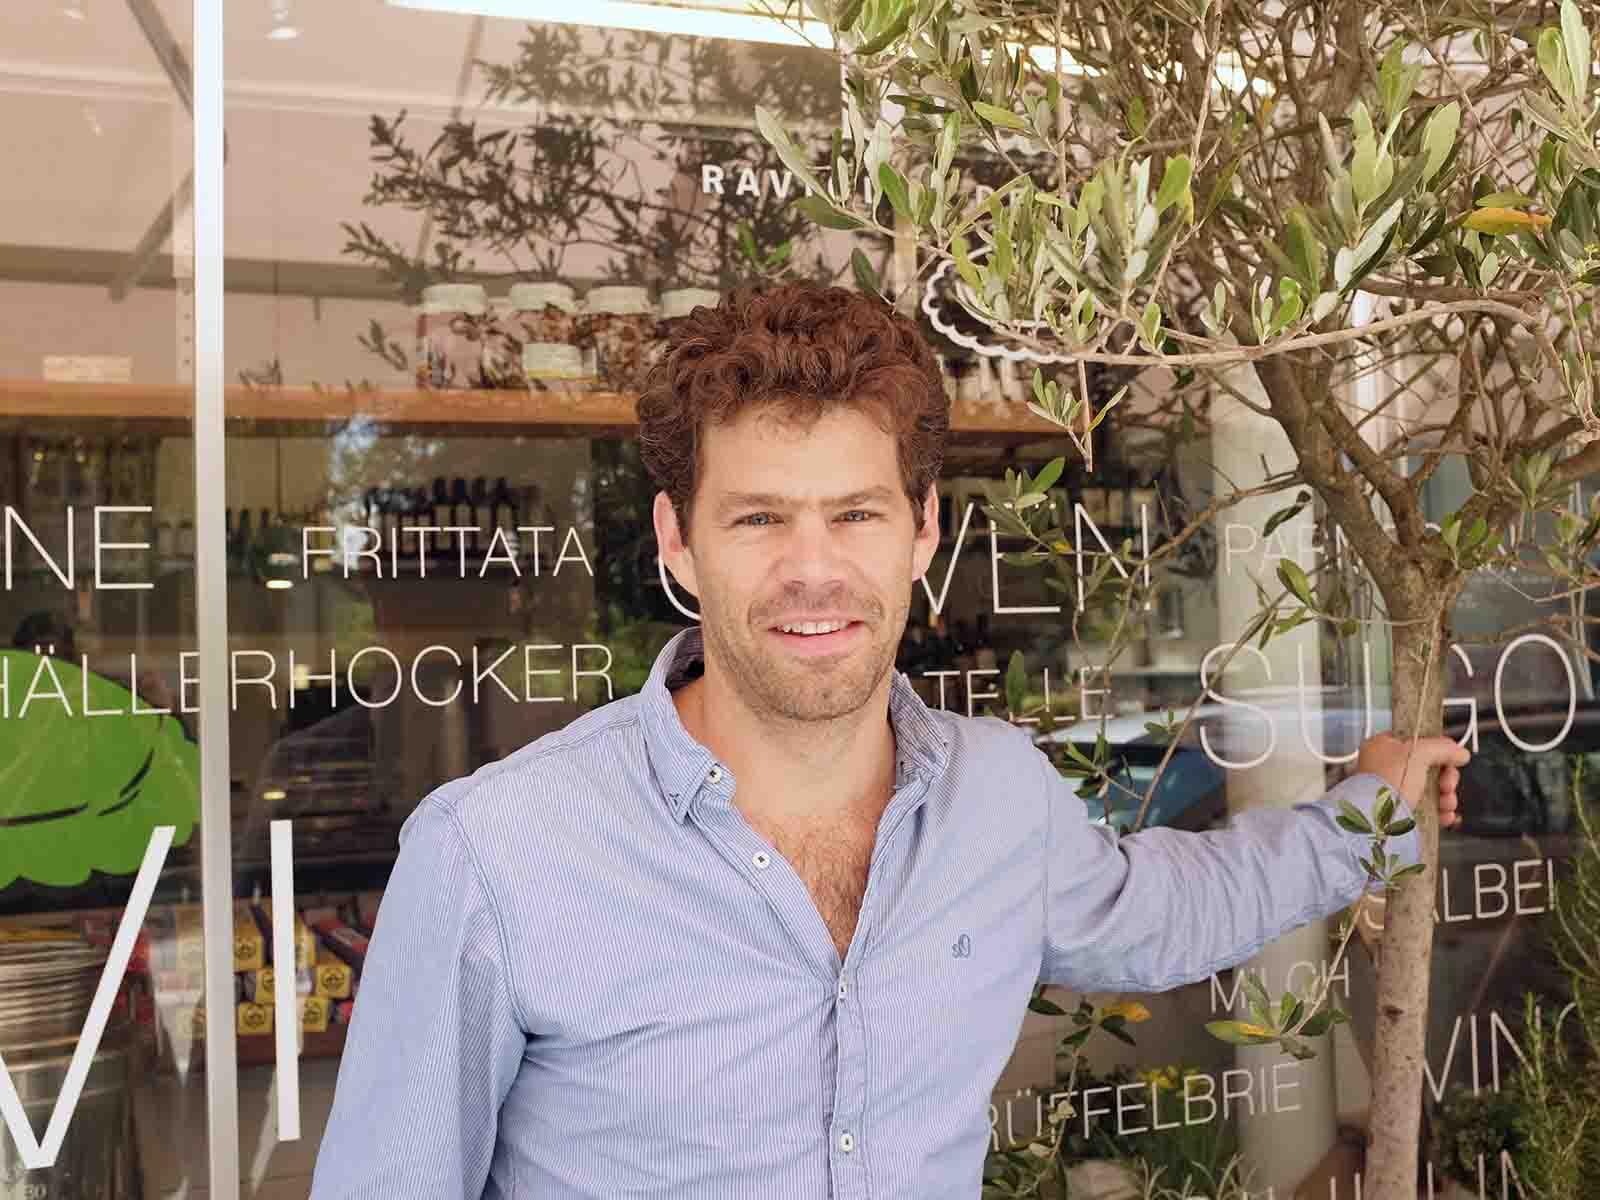 «Ravioli, Delikatessen und Kinder» – Samuel Binkert vor dem «Bravo»-Ladenlokal.